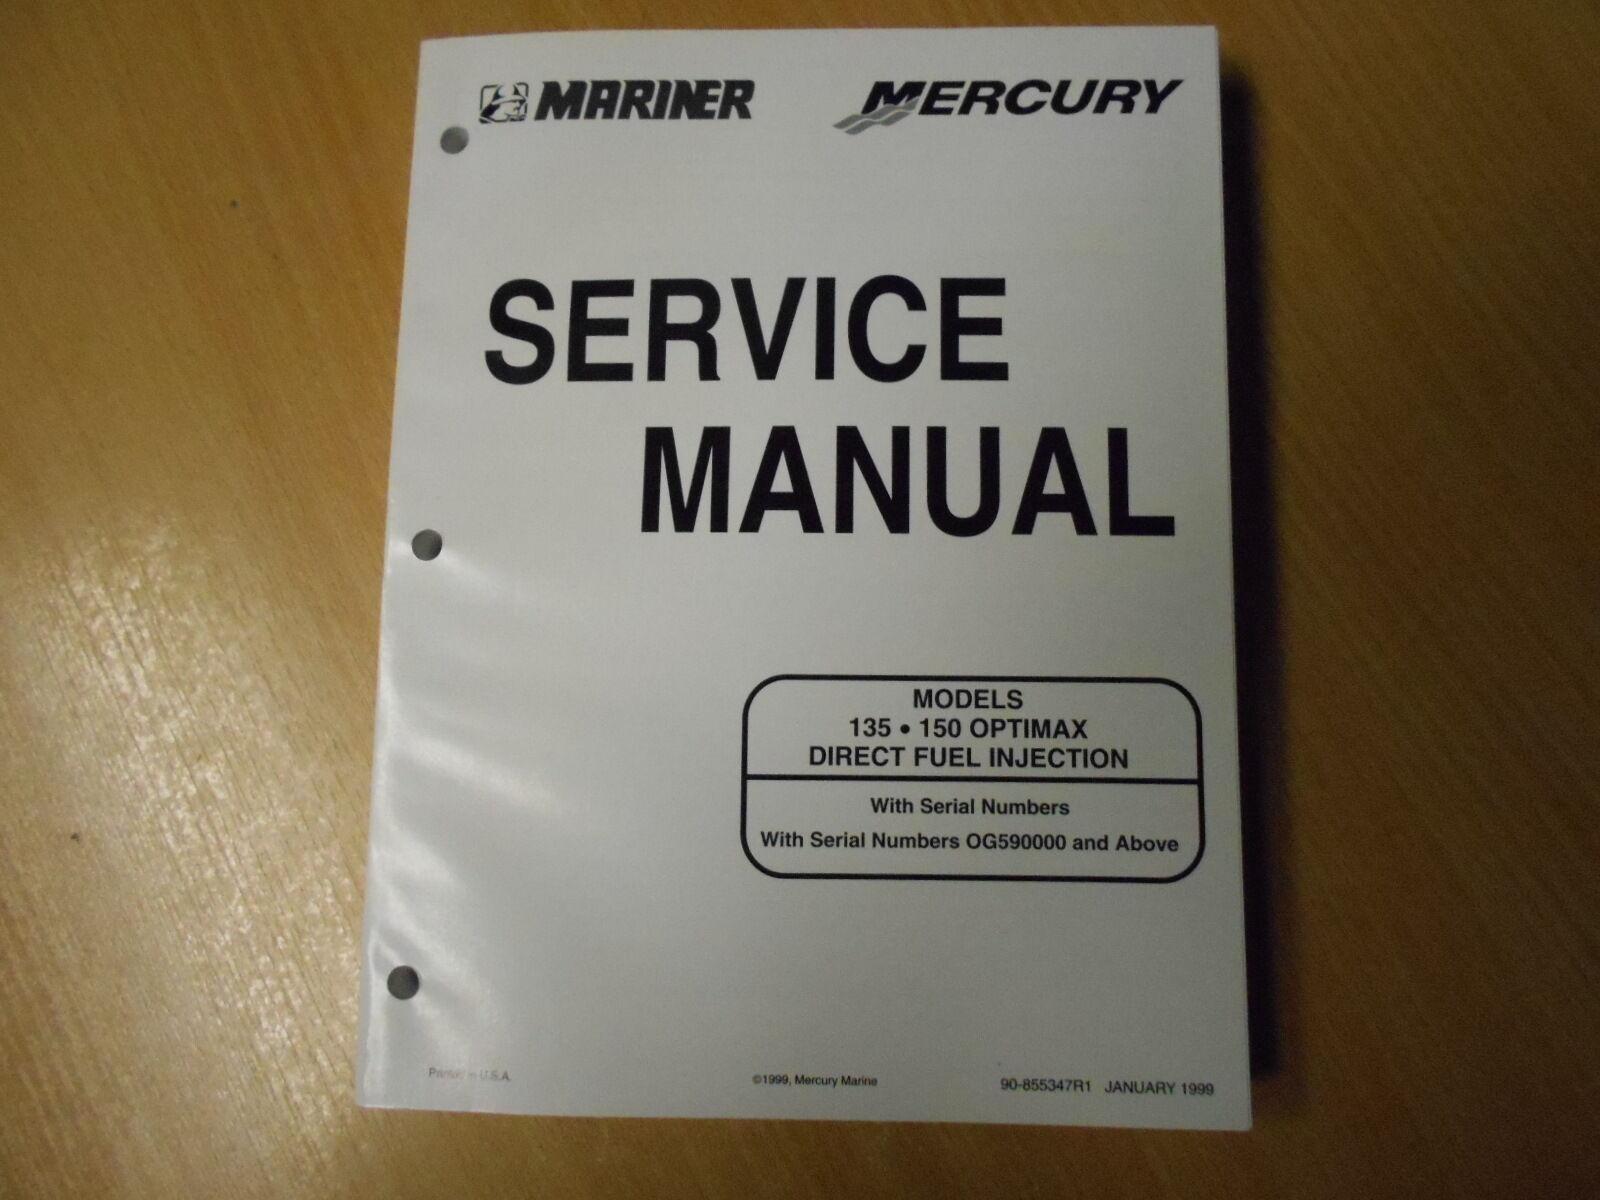 Werkstatthandbuch Service manual  Mariner Mercury 135 / 150 DFI OptiMax